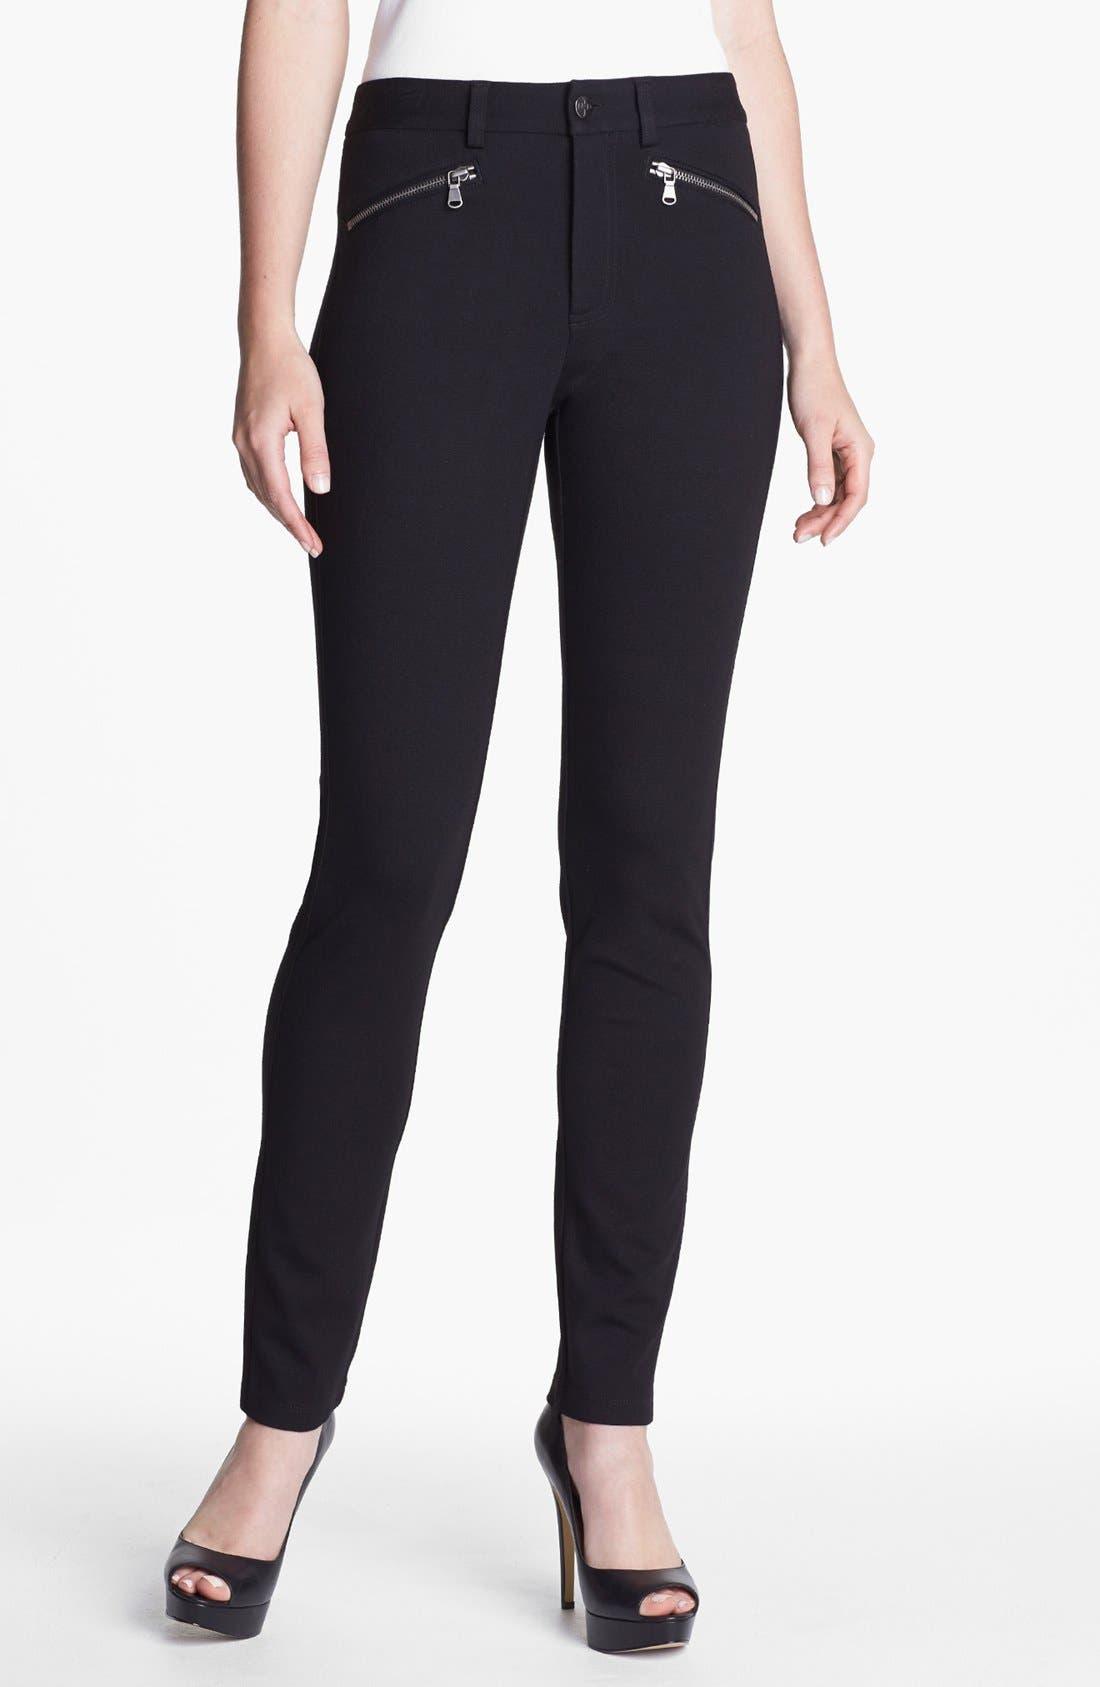 Alternate Image 1 Selected - NYDJ Zip Trim Skinny Stretch Ponte Pants